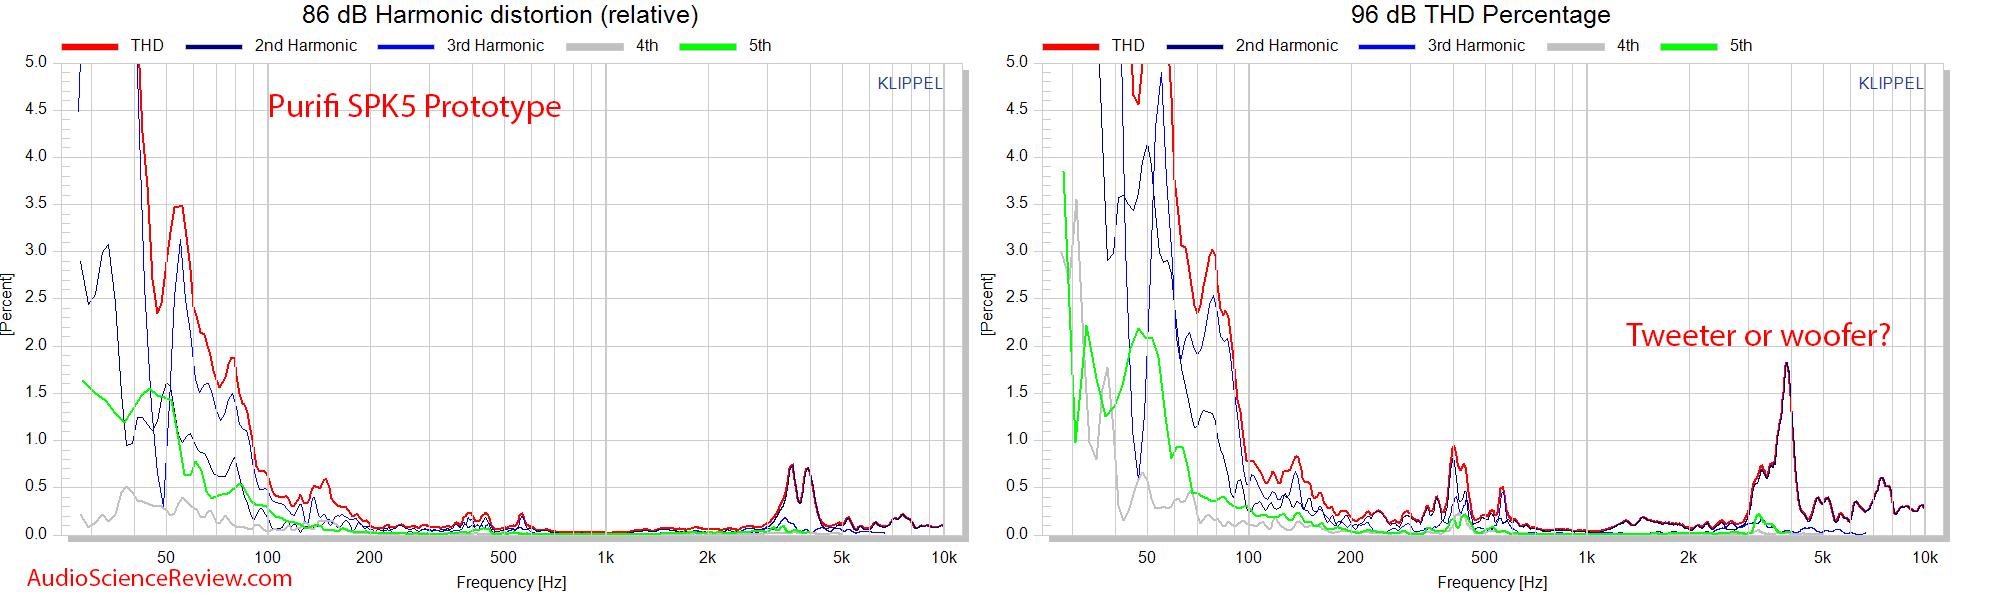 Celuaris Purifi SPK5 Woofer Measurements relative THD distortion.png